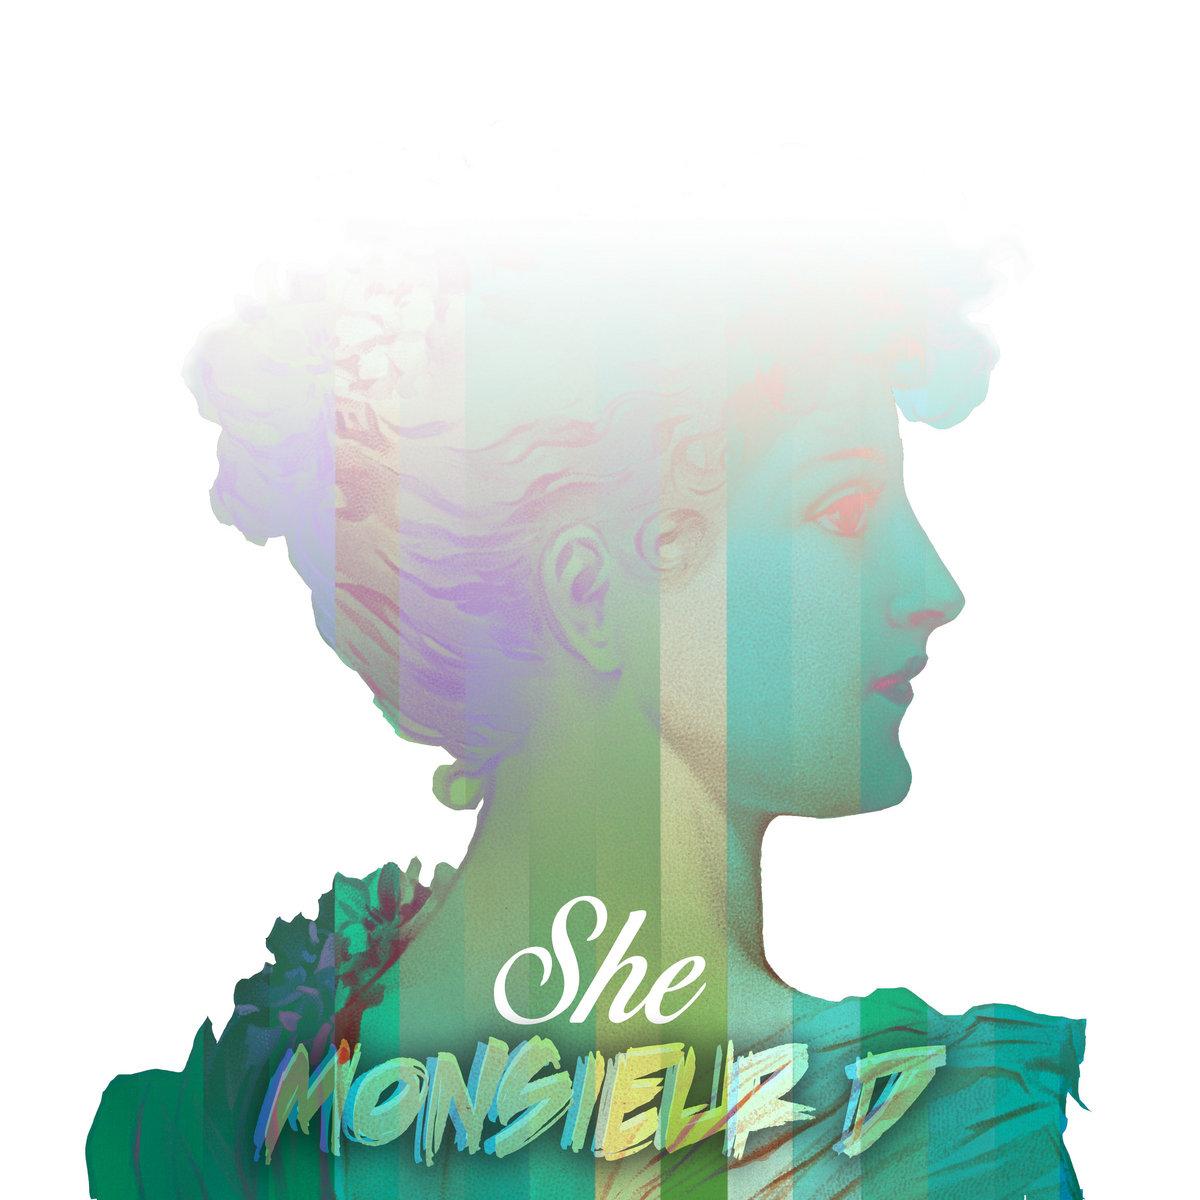 She by Monsieur D